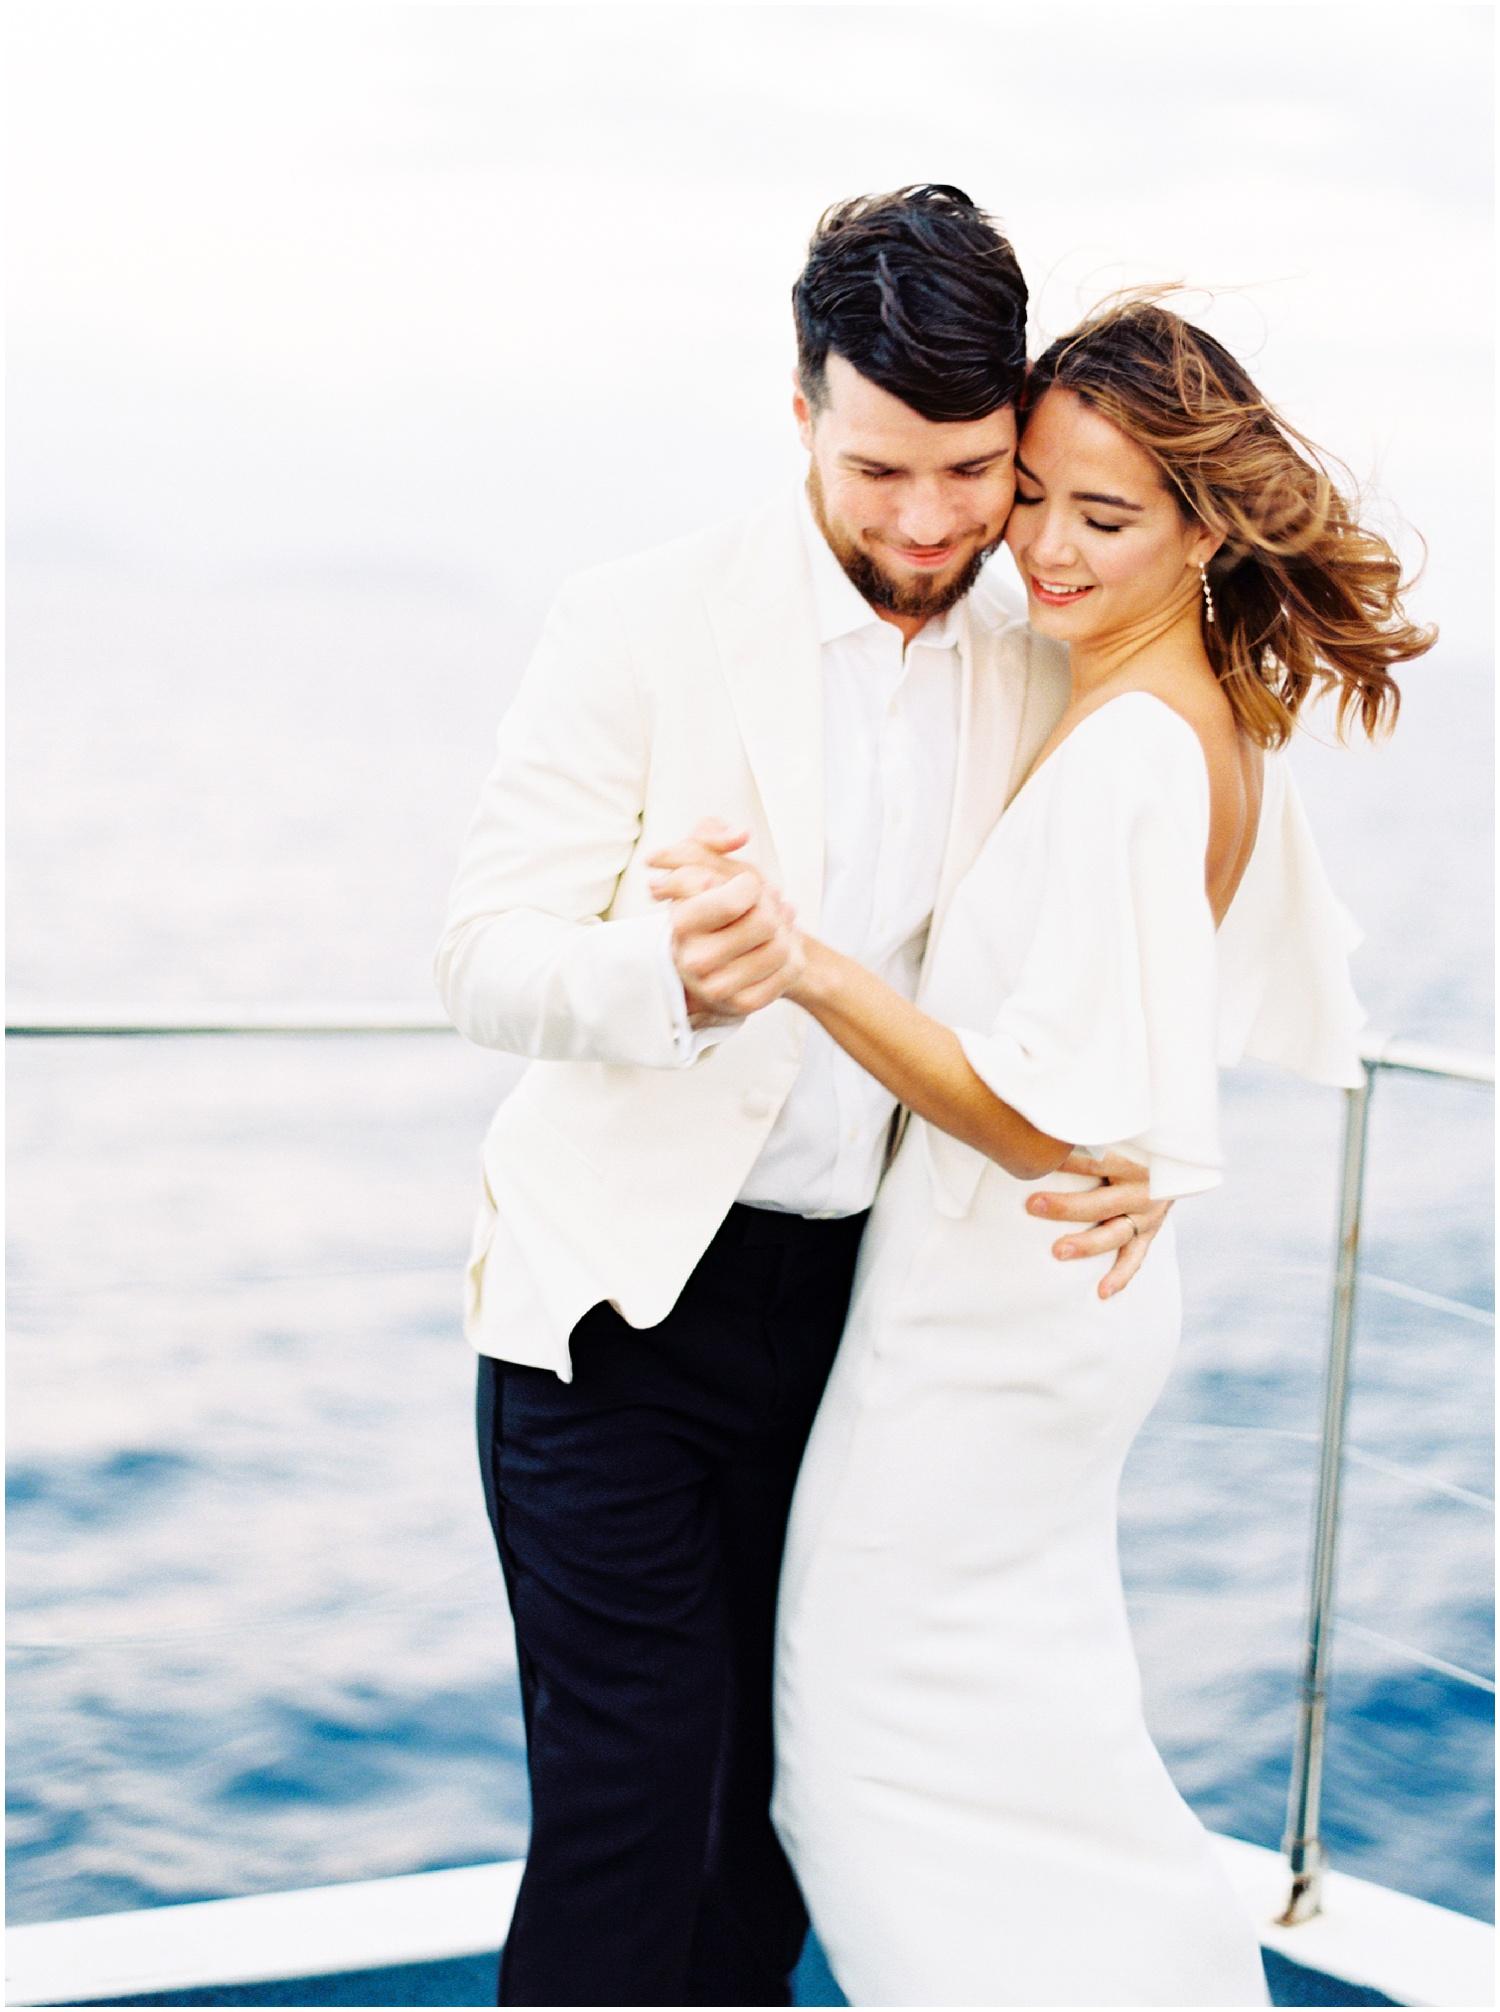 fresno Wedding photographers, fresno wedding photography, california fine art film photographer, san luis obispo wedding photographers